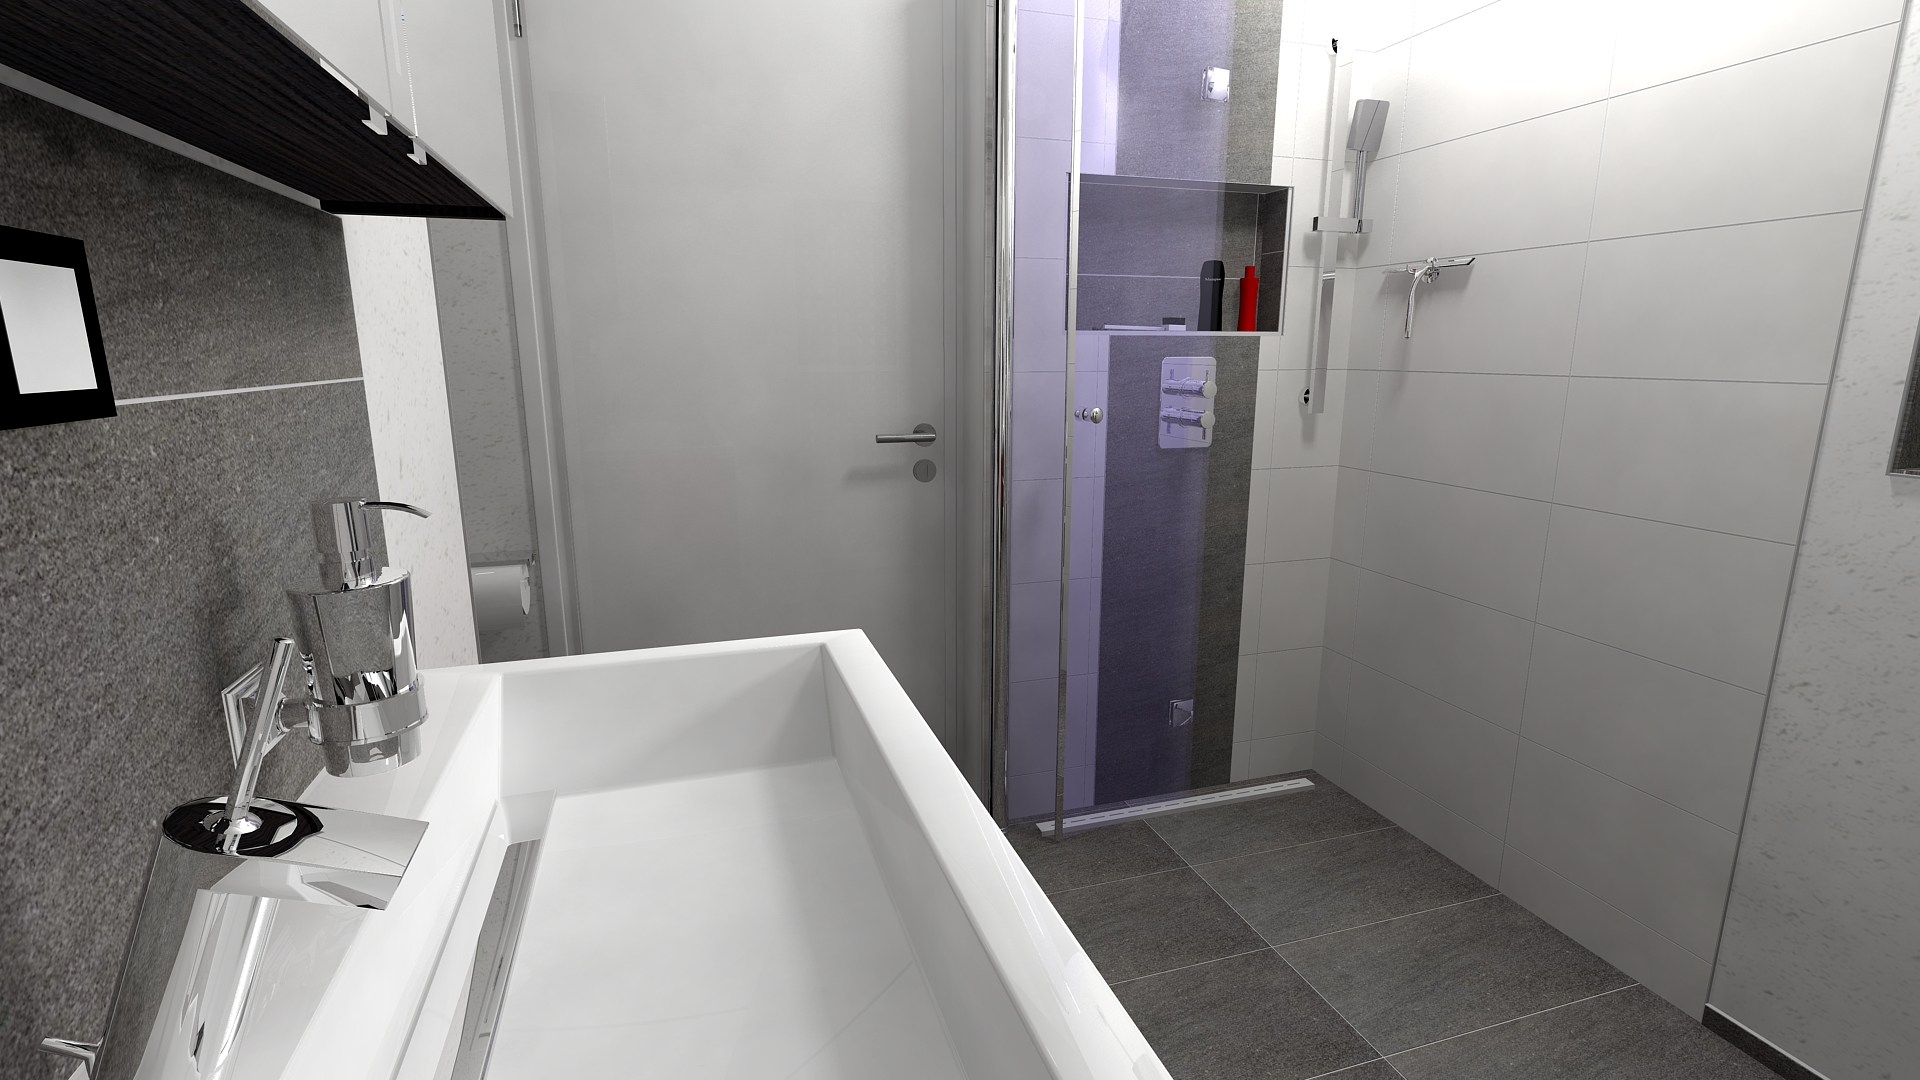 Kunden-Bad Bathroom By Gerd Nolte Inh.R.Schumann(Gerd Nolte Heizung ...